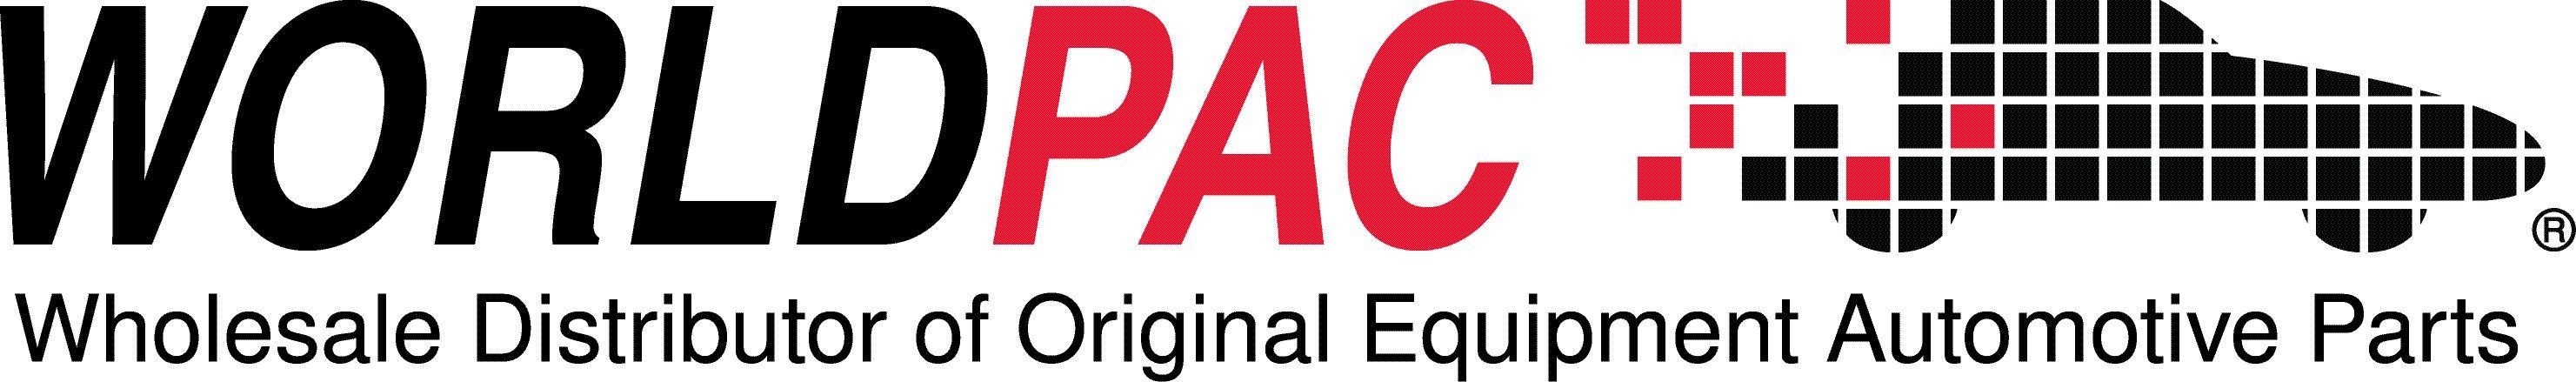 Worldpac expands in California